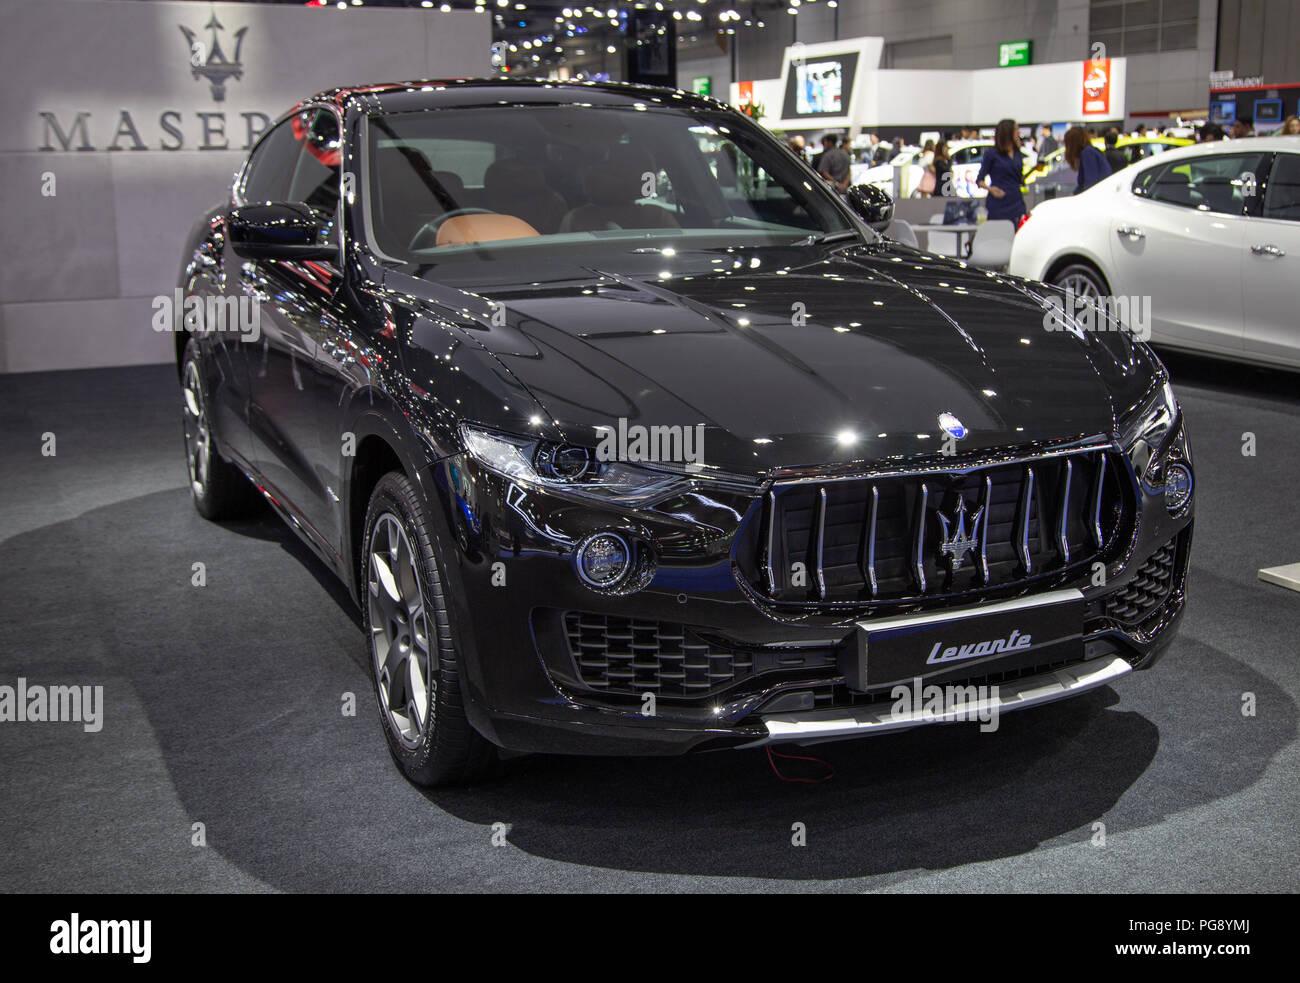 Bangkok, Thailand - August 22, 2018: Maserati Levante crossover SUV presented in Big Motor Sale 2018 - Stock Image